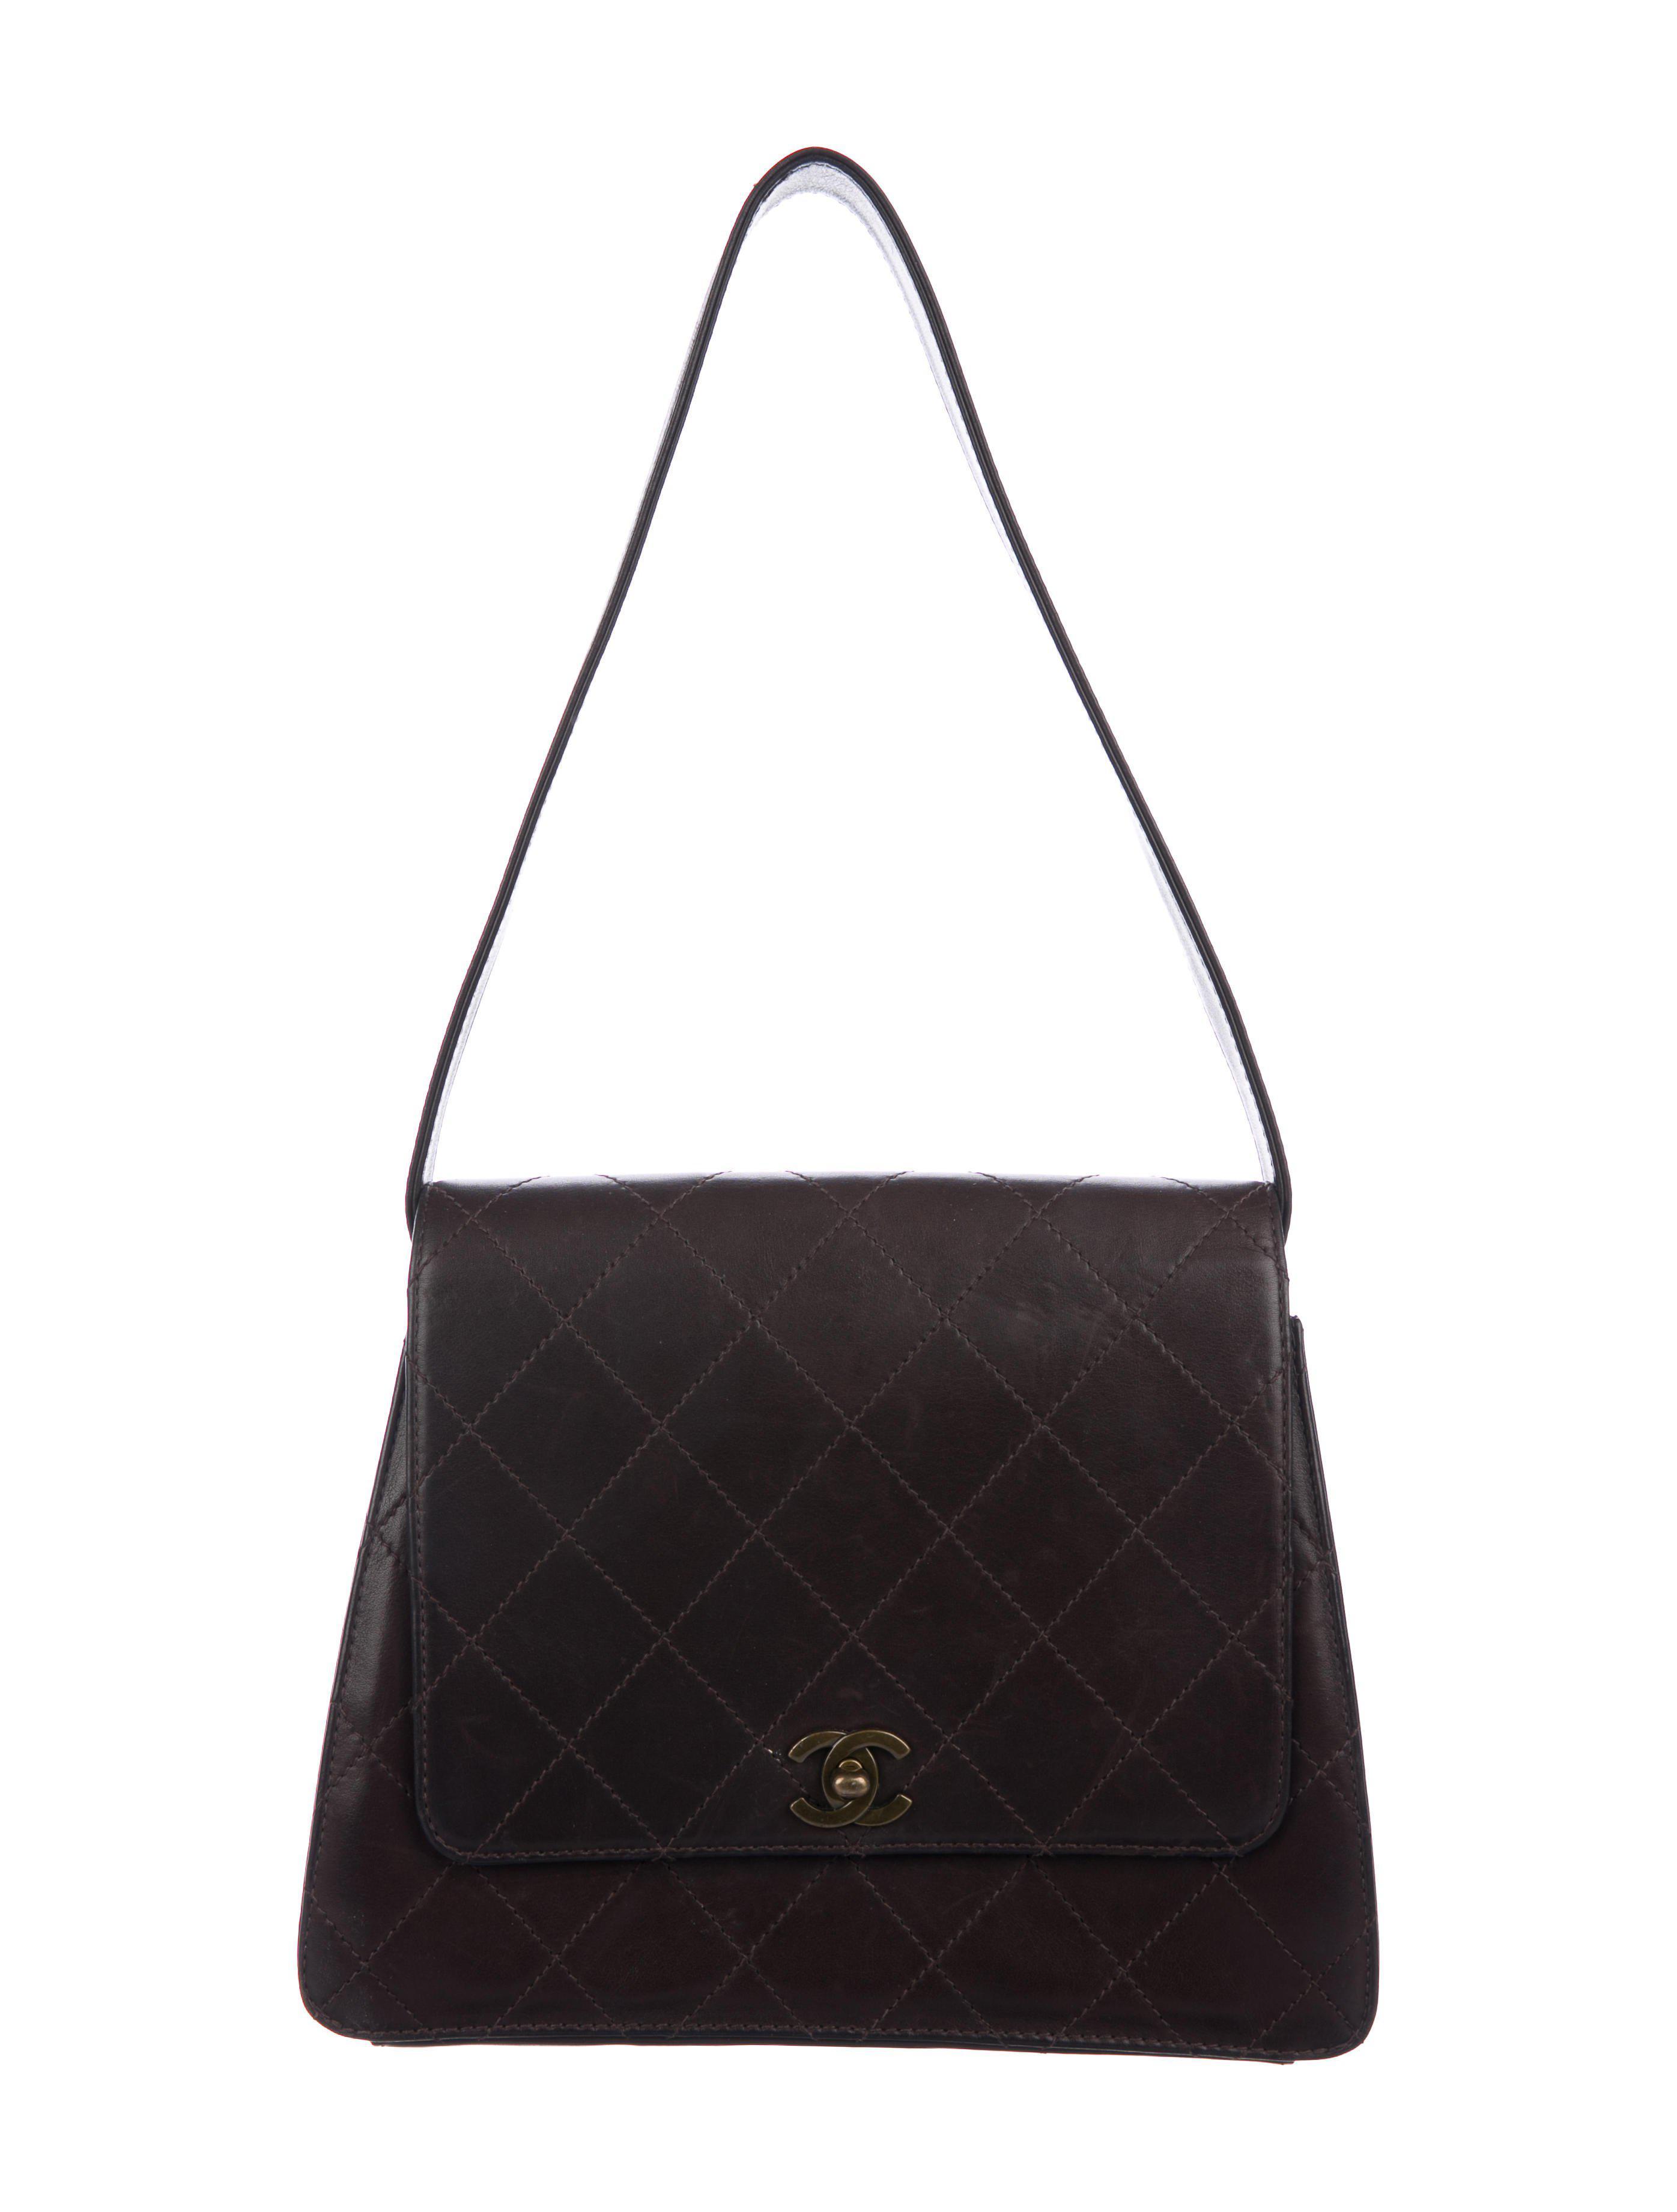 ?diamond Chanel flap bag